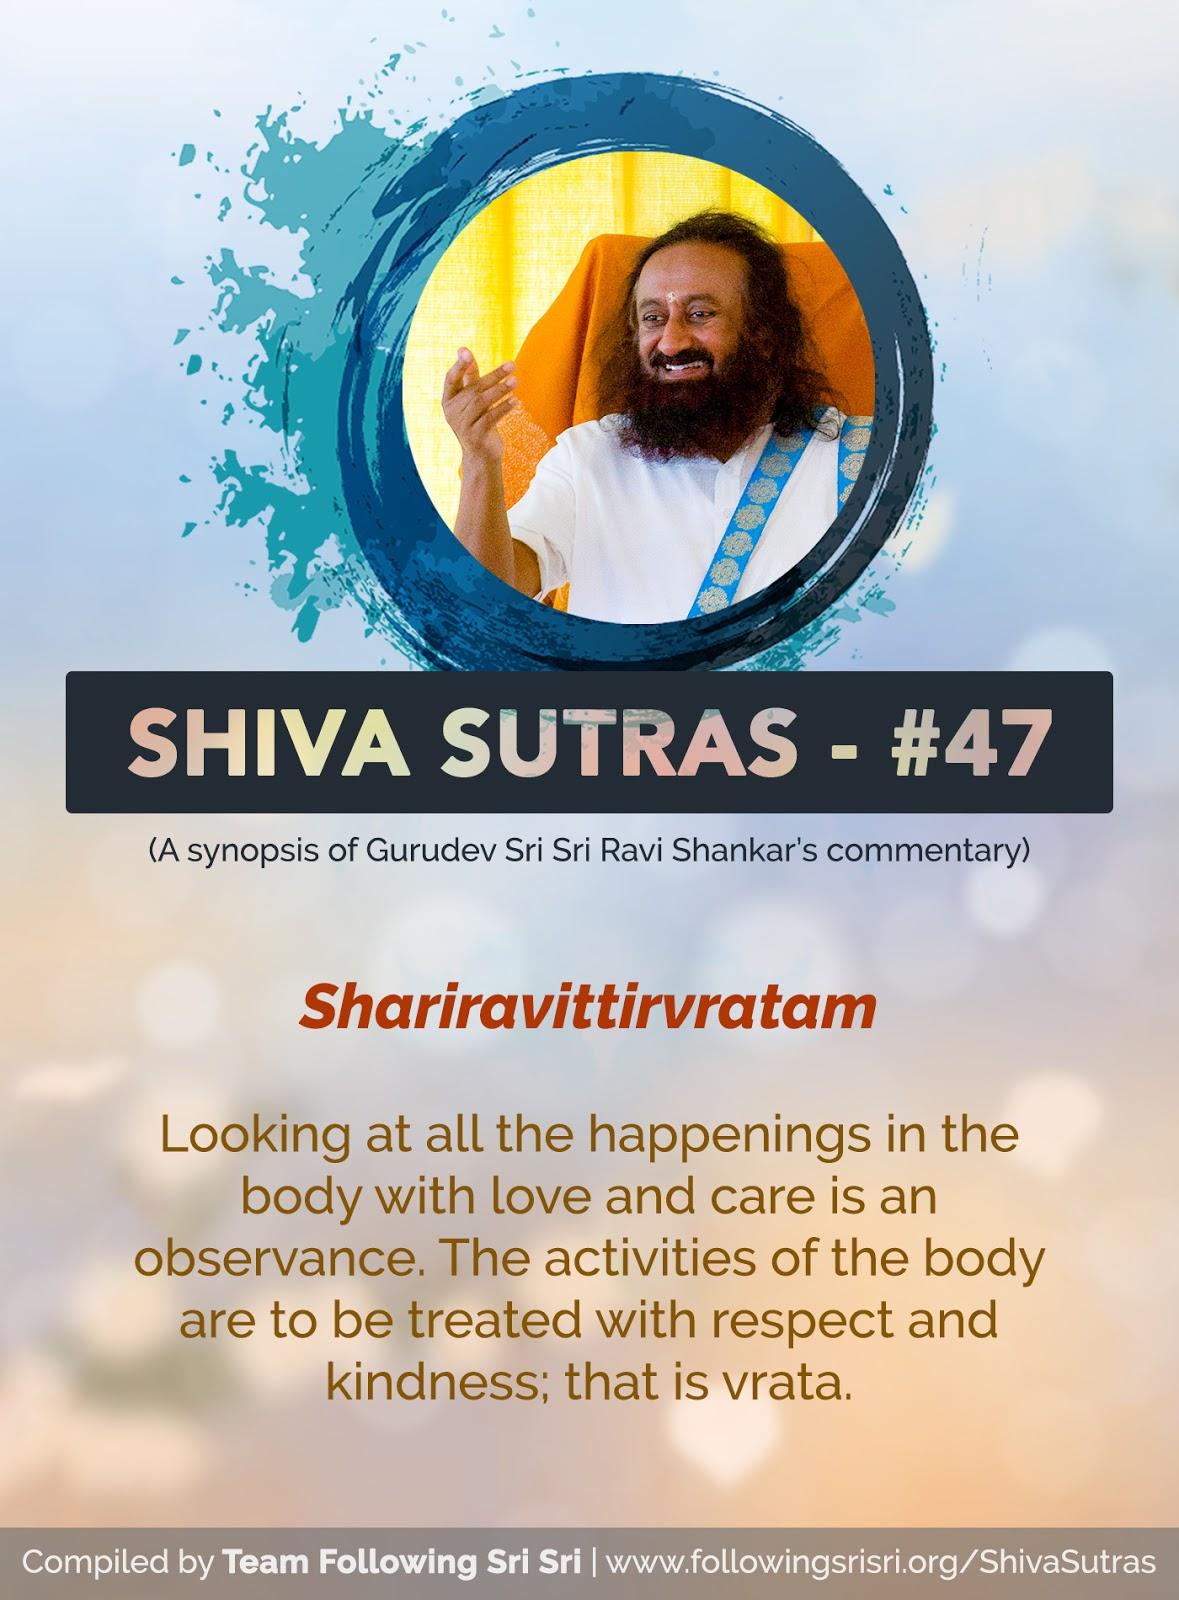 Shiva Sutras - Sutra 47